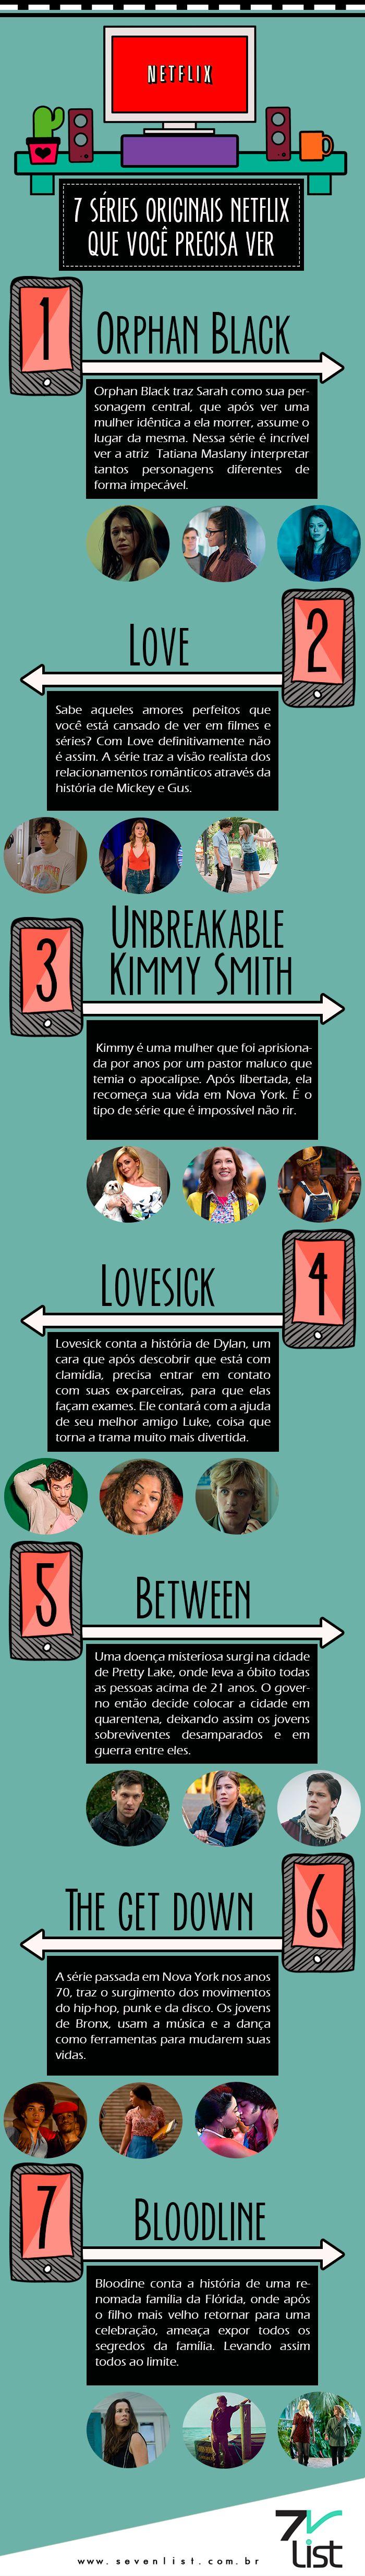 #SevenList #CabideColorido #Art #Design #Infográfico #Netflix #Séries #Film #Tv #OrphanBlack #Love #TheGetDown #Lovesick #Bloodline